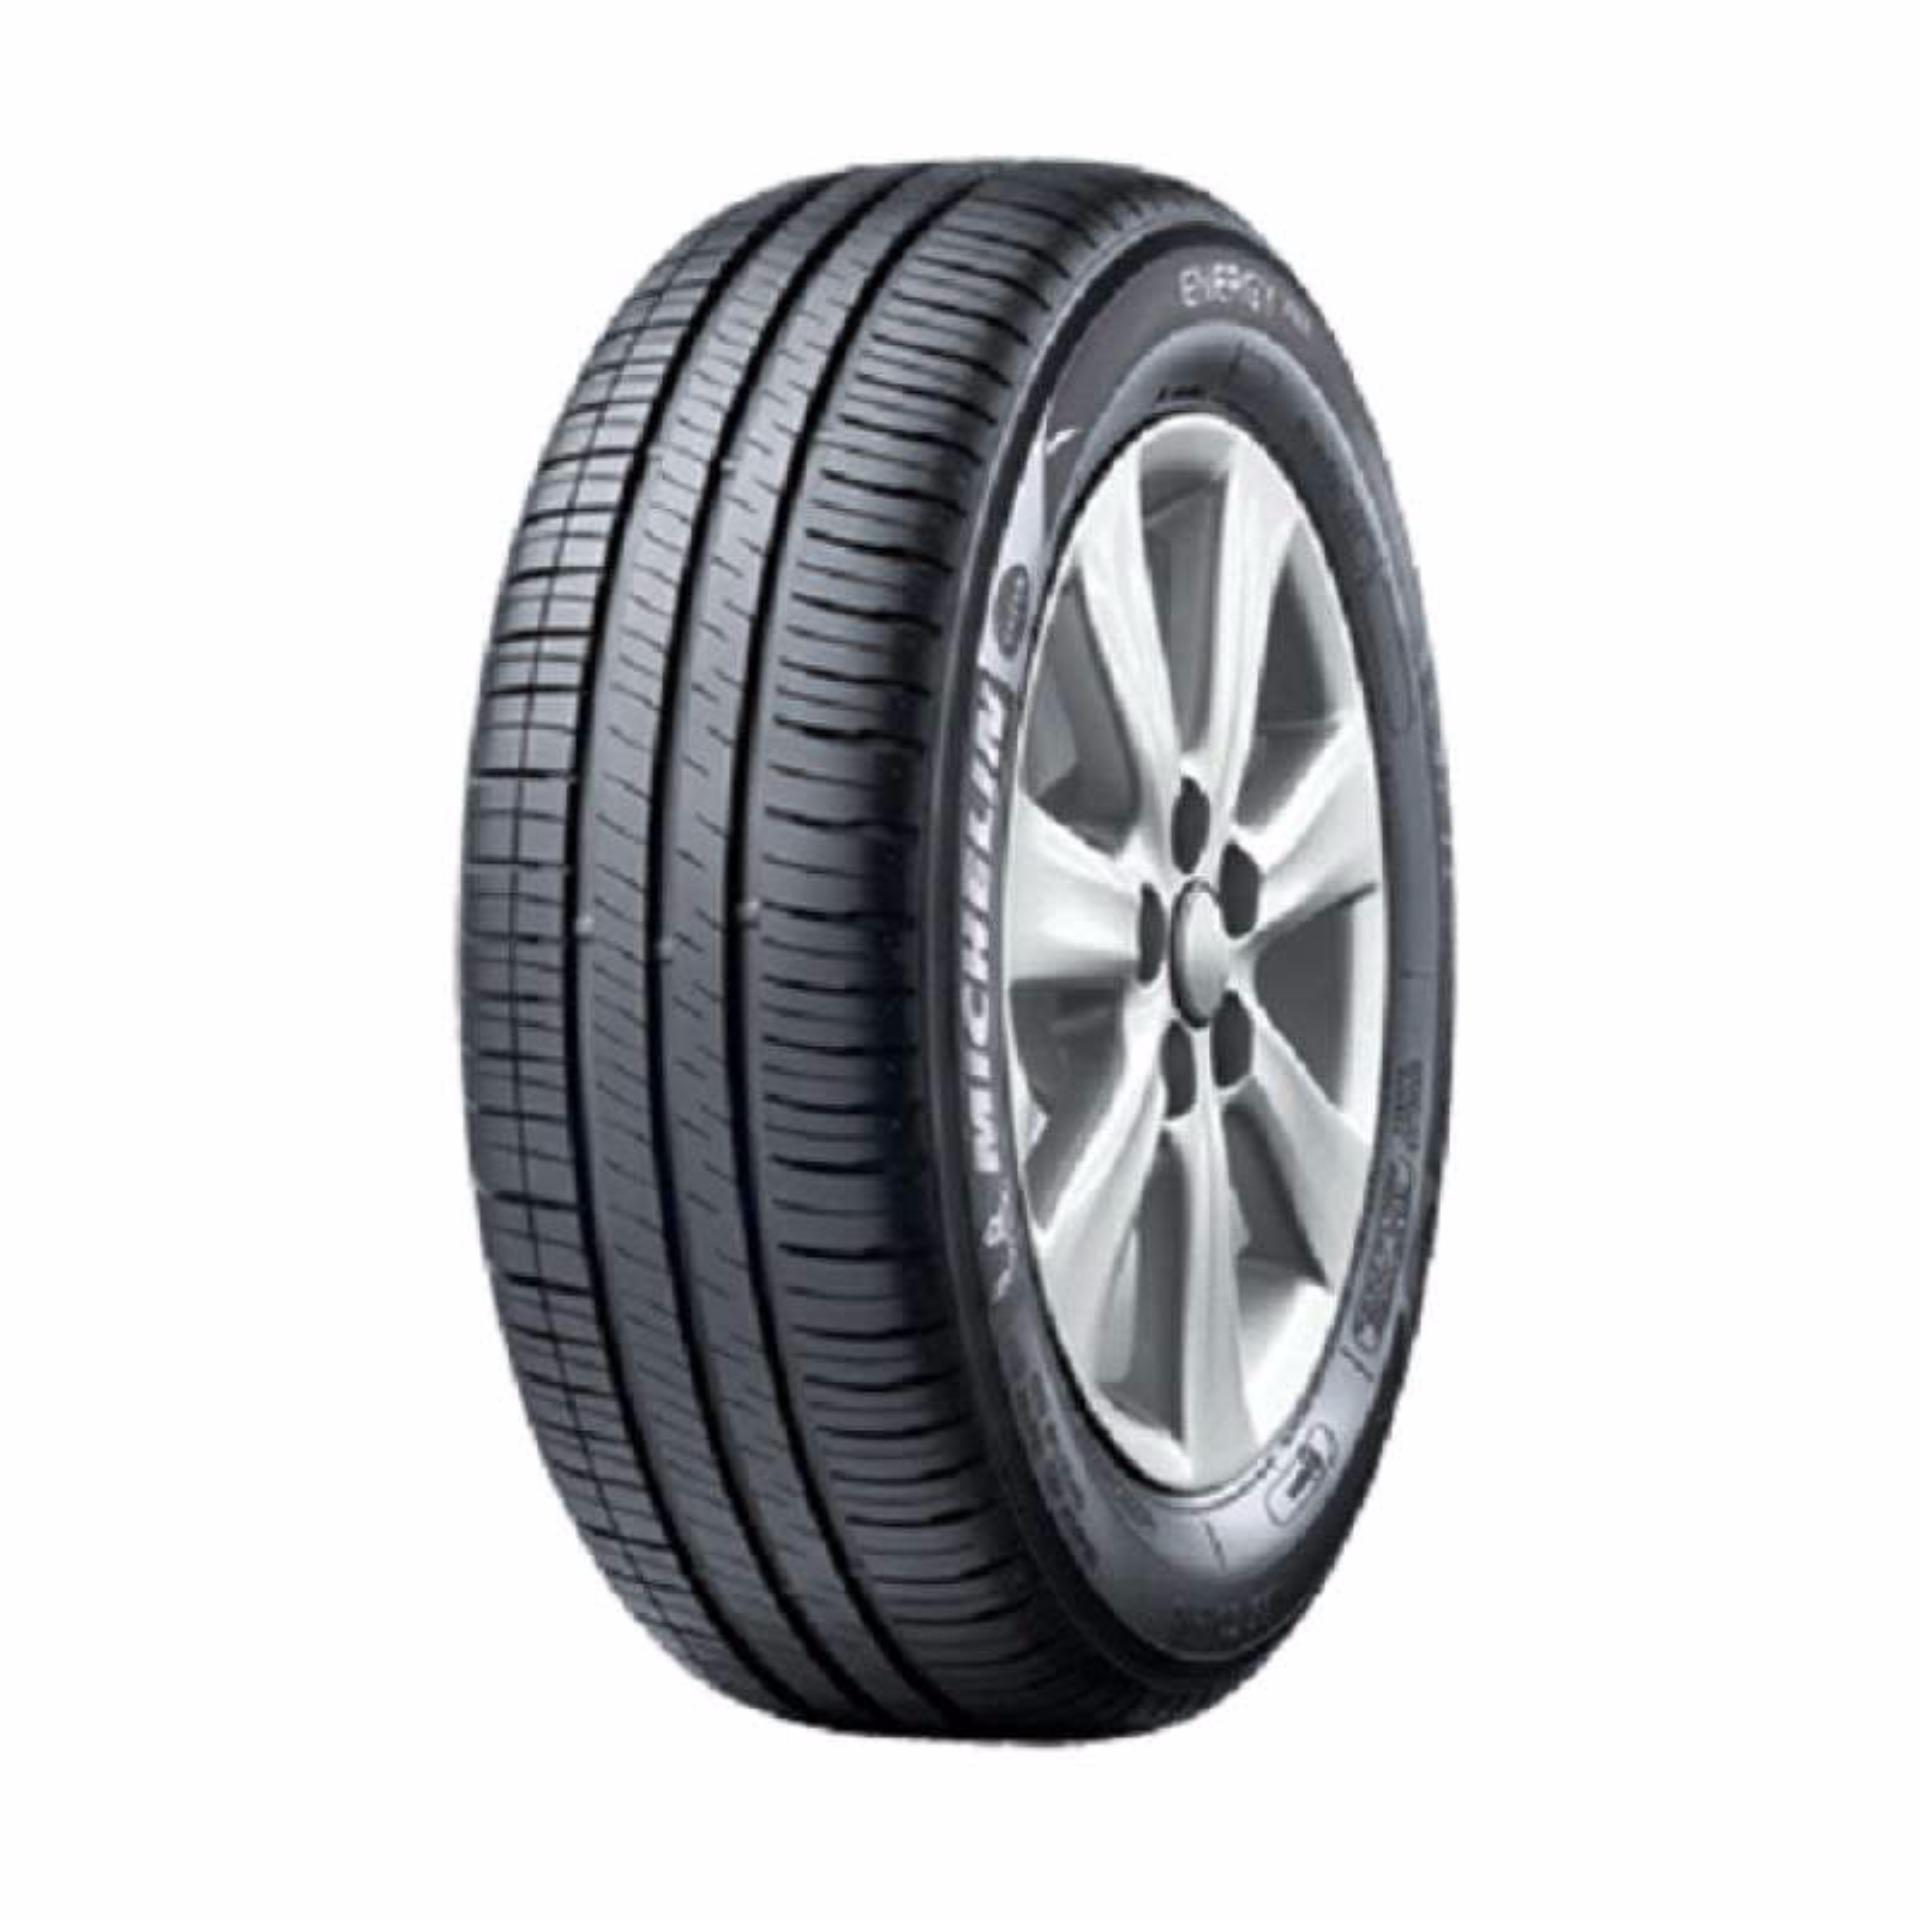 Michelin XM2 205/65 R15 Ban Mobil [GRATIS INSTALASI]